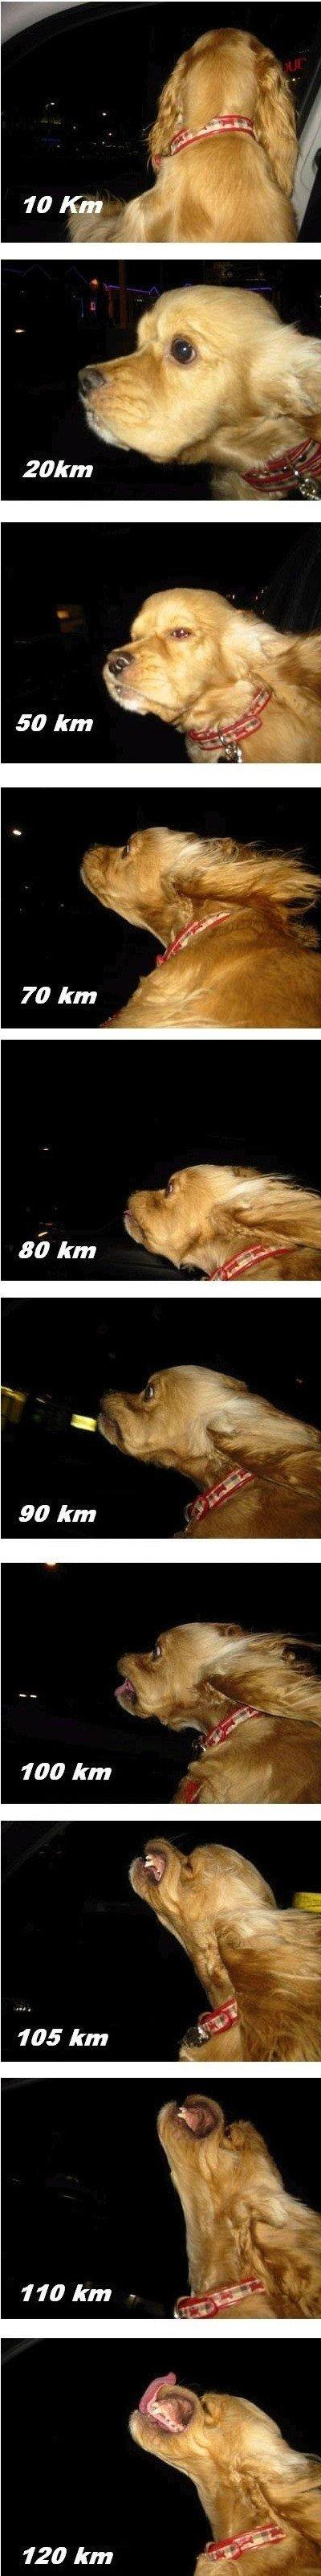 Speedy Dawg. . 90 km. at 90k it looks like his drinking Speedy Dawg 90 km at 90k it looks like his drinking